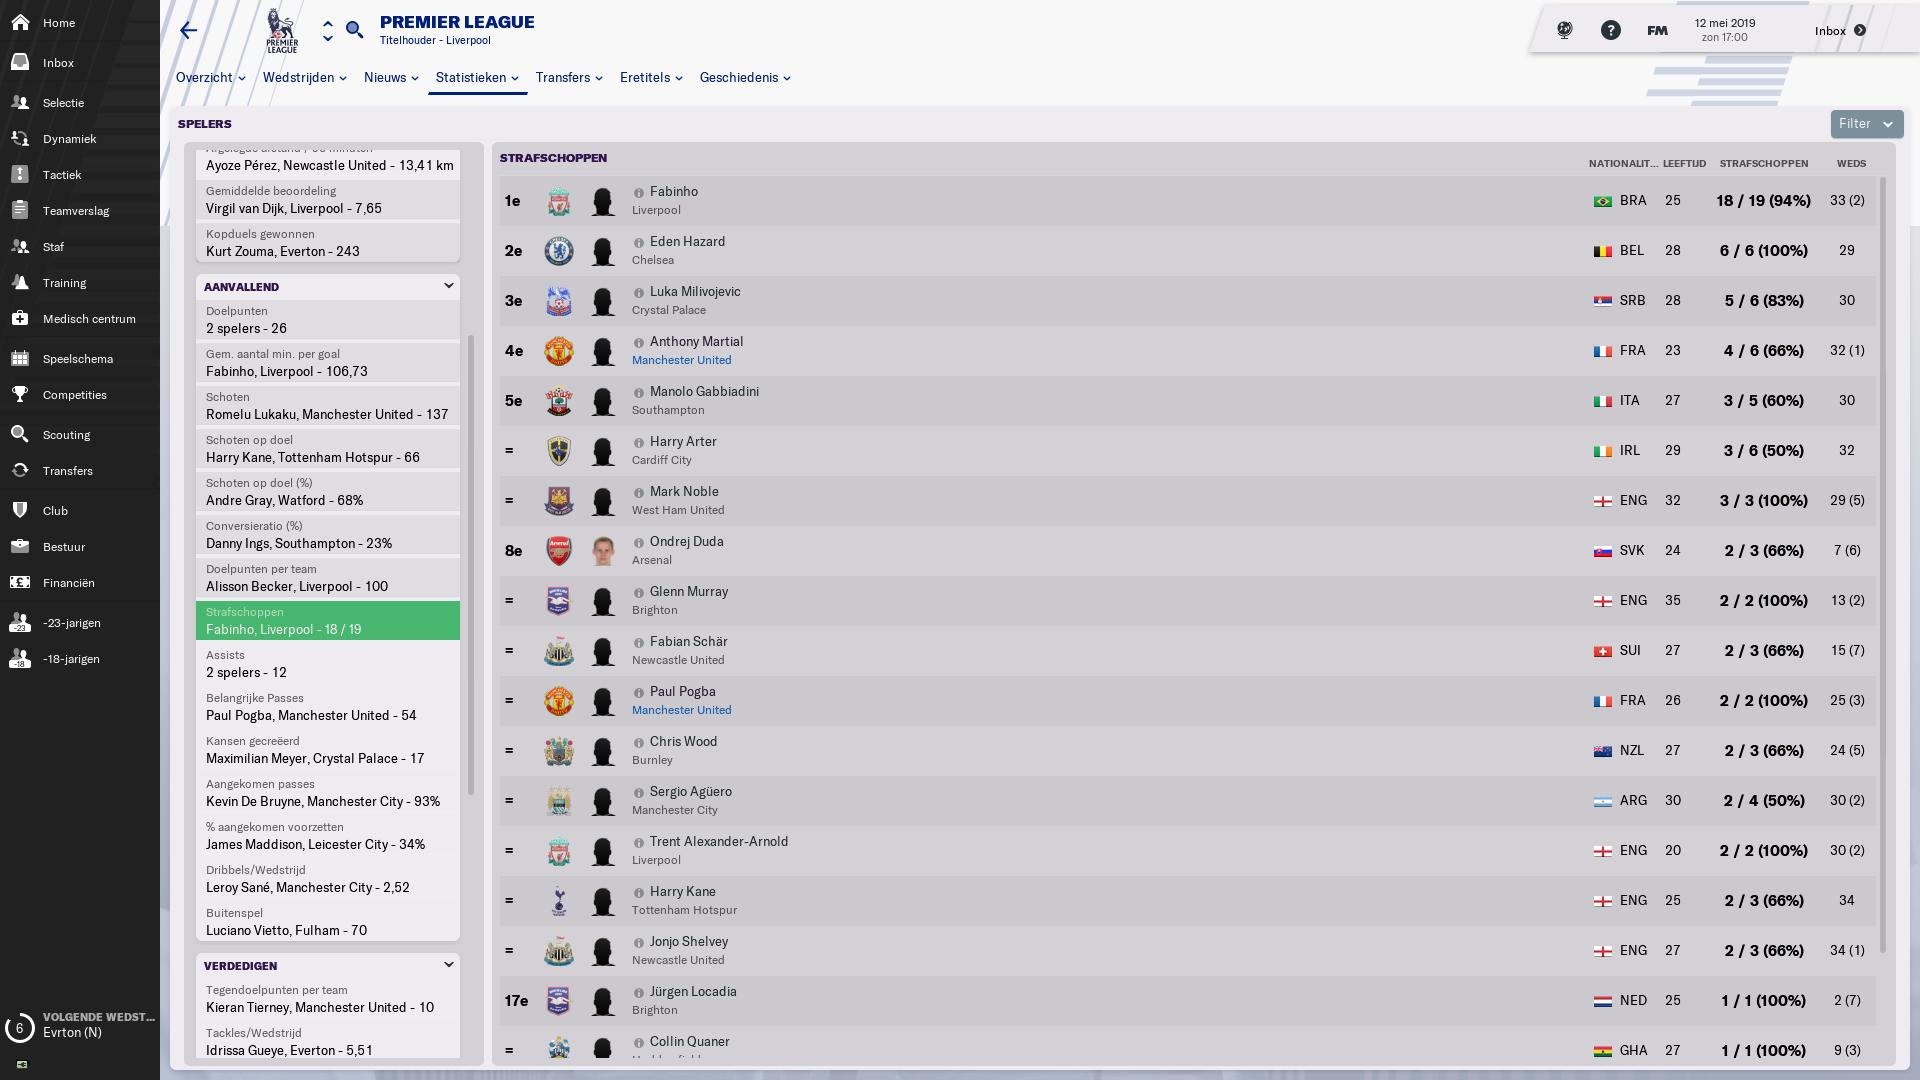 5c29510887deb-Premier_League__Statistiek